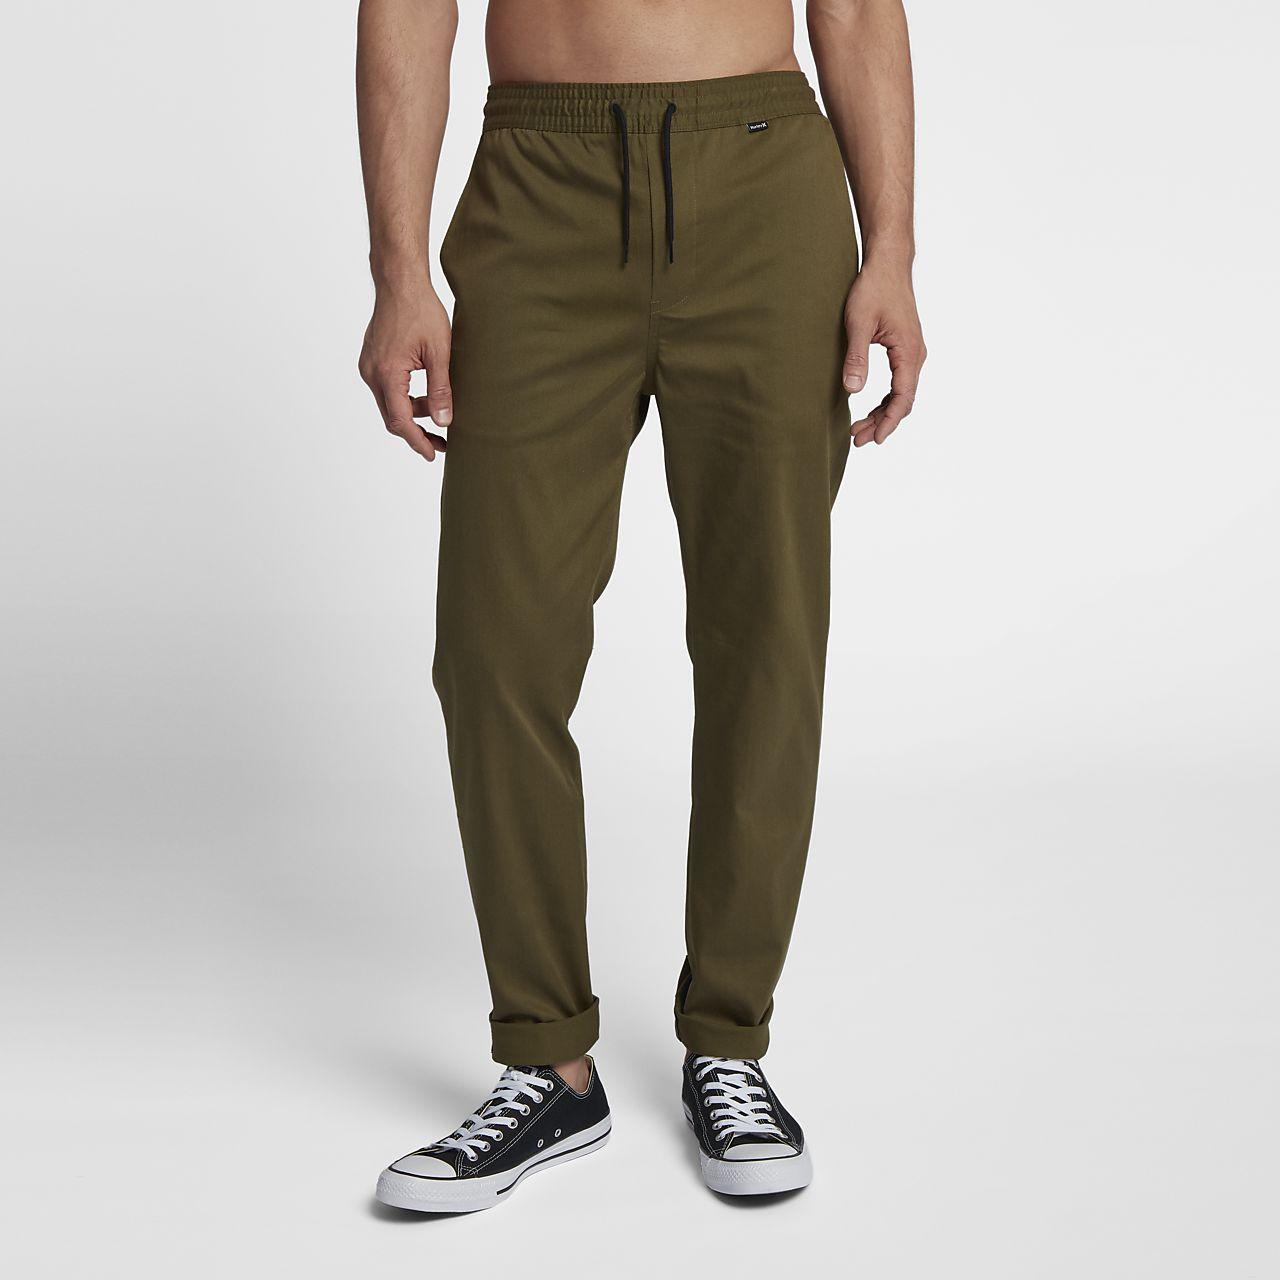 Hurley Dri-FIT Ditch Pantalons - Home